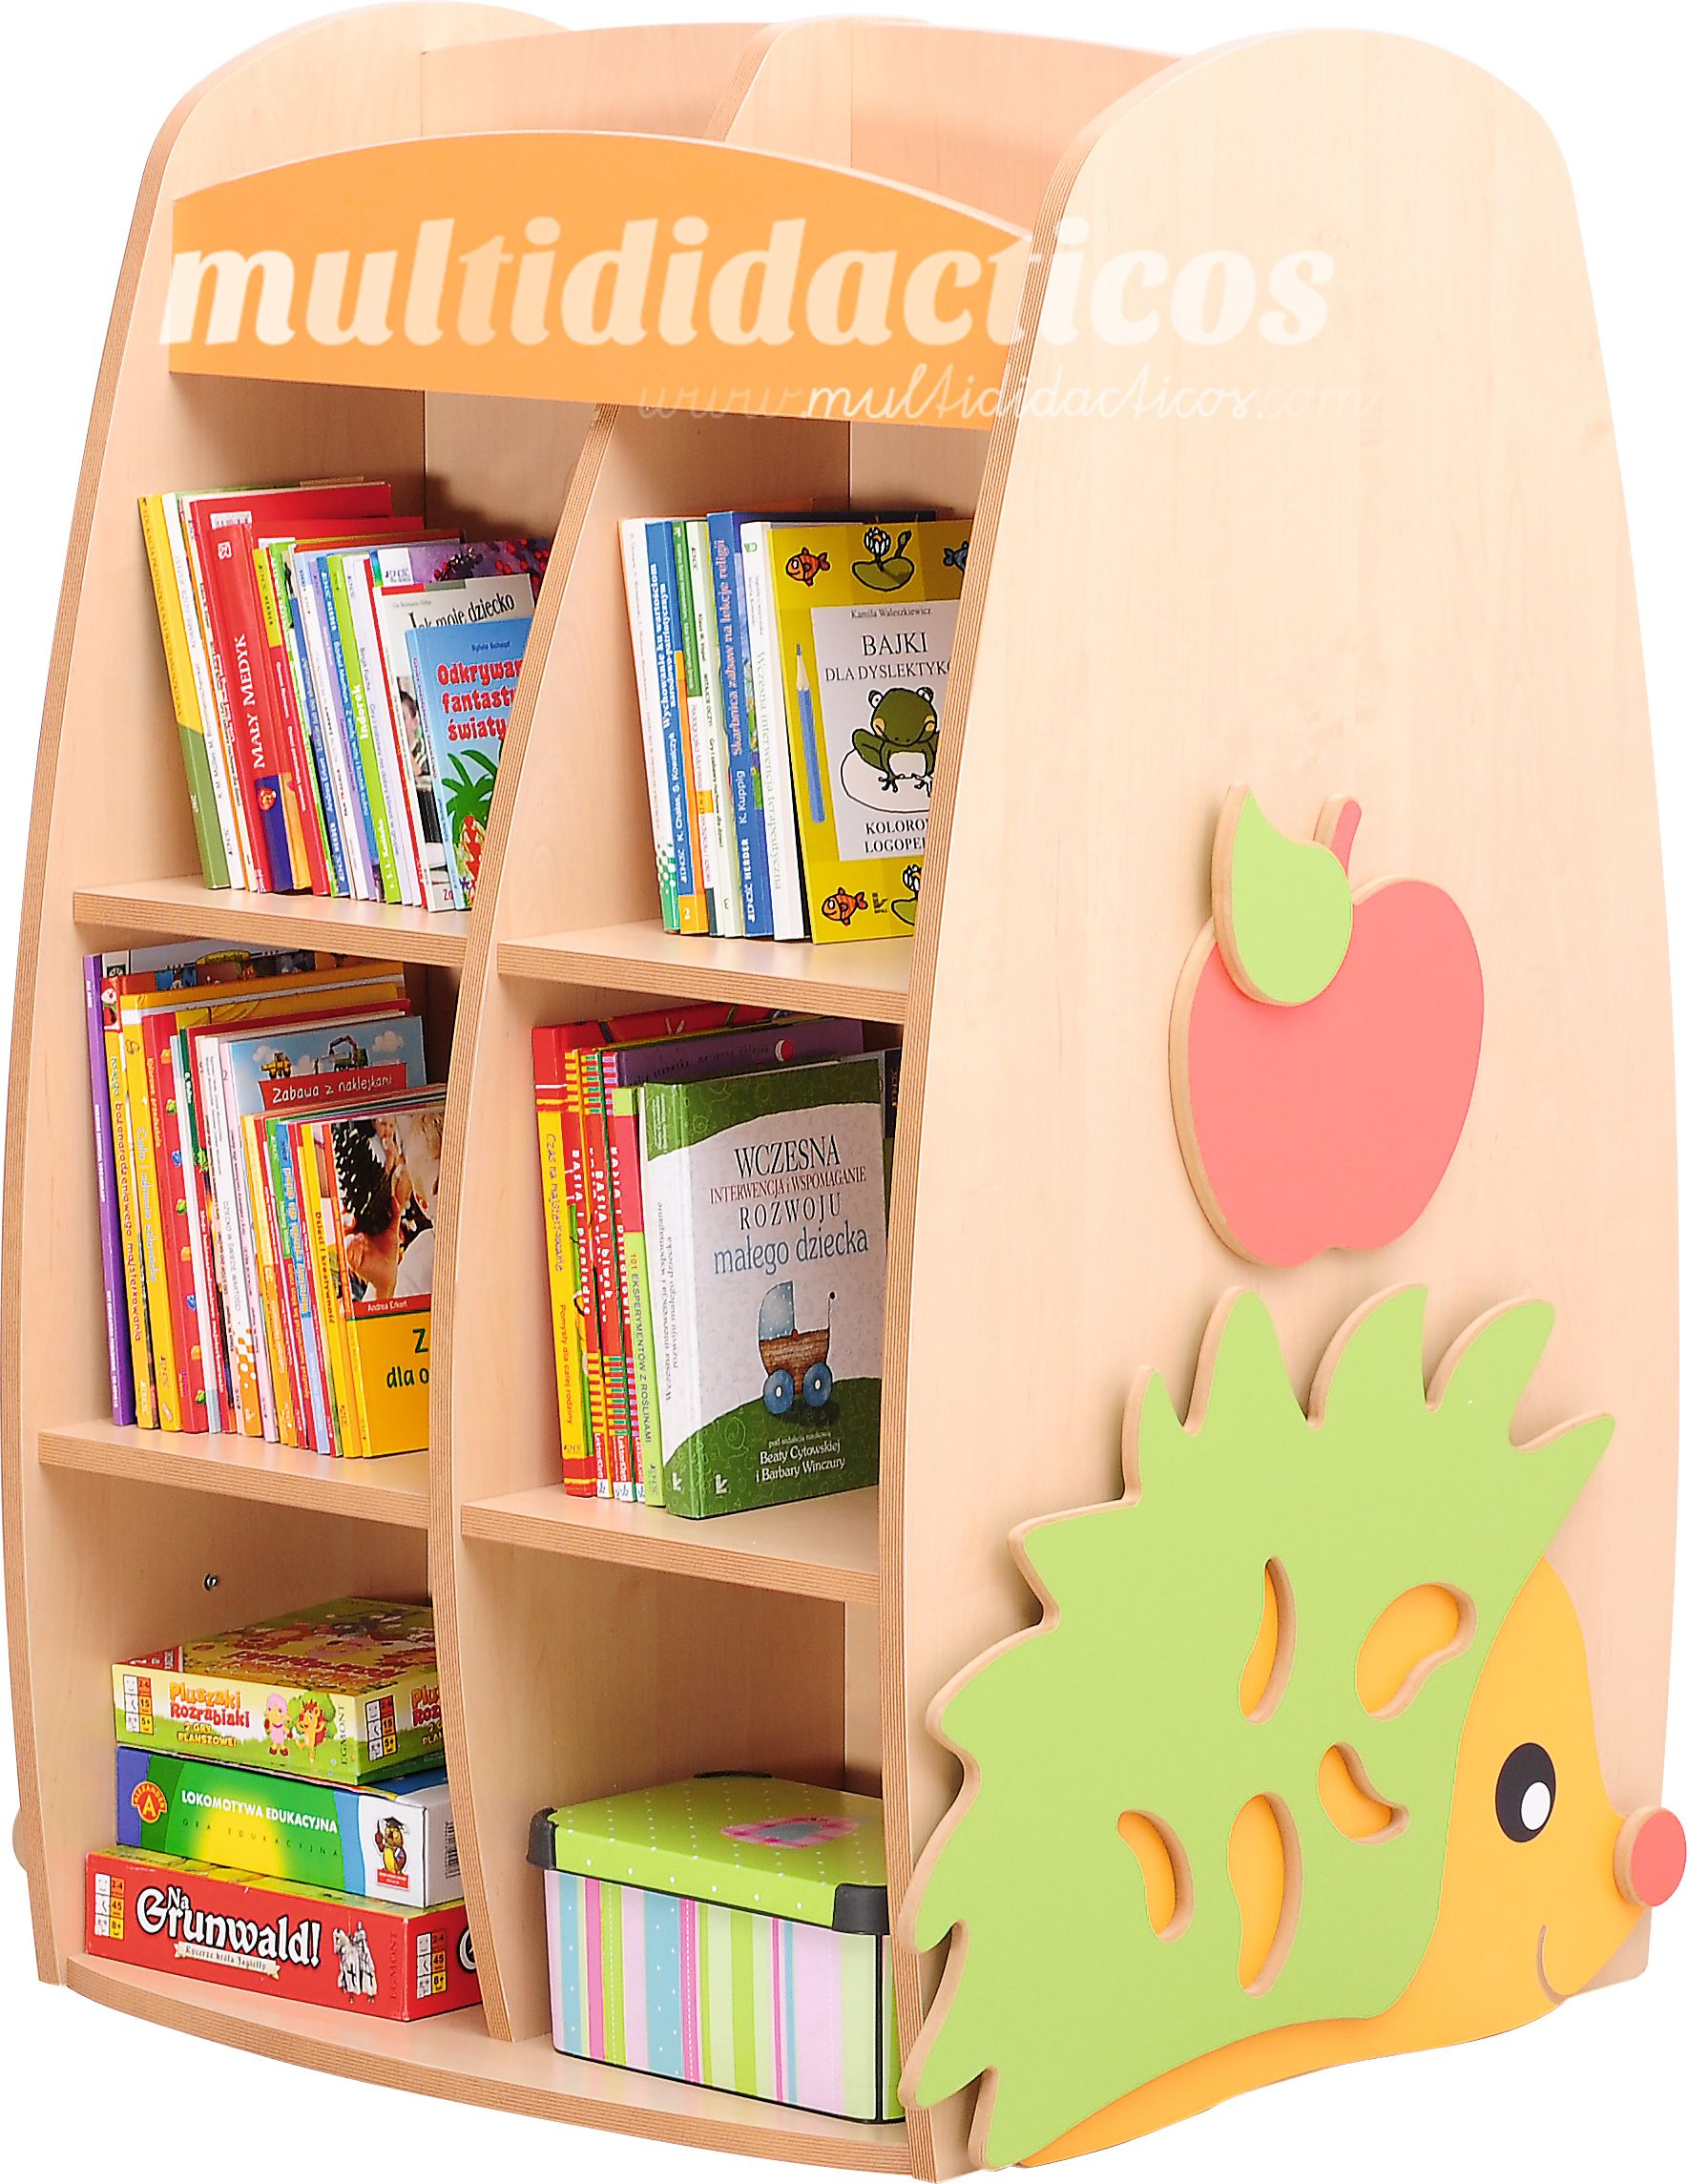 Estanter a para libros mobiliario infantil escuela for Estanteria pared infantil